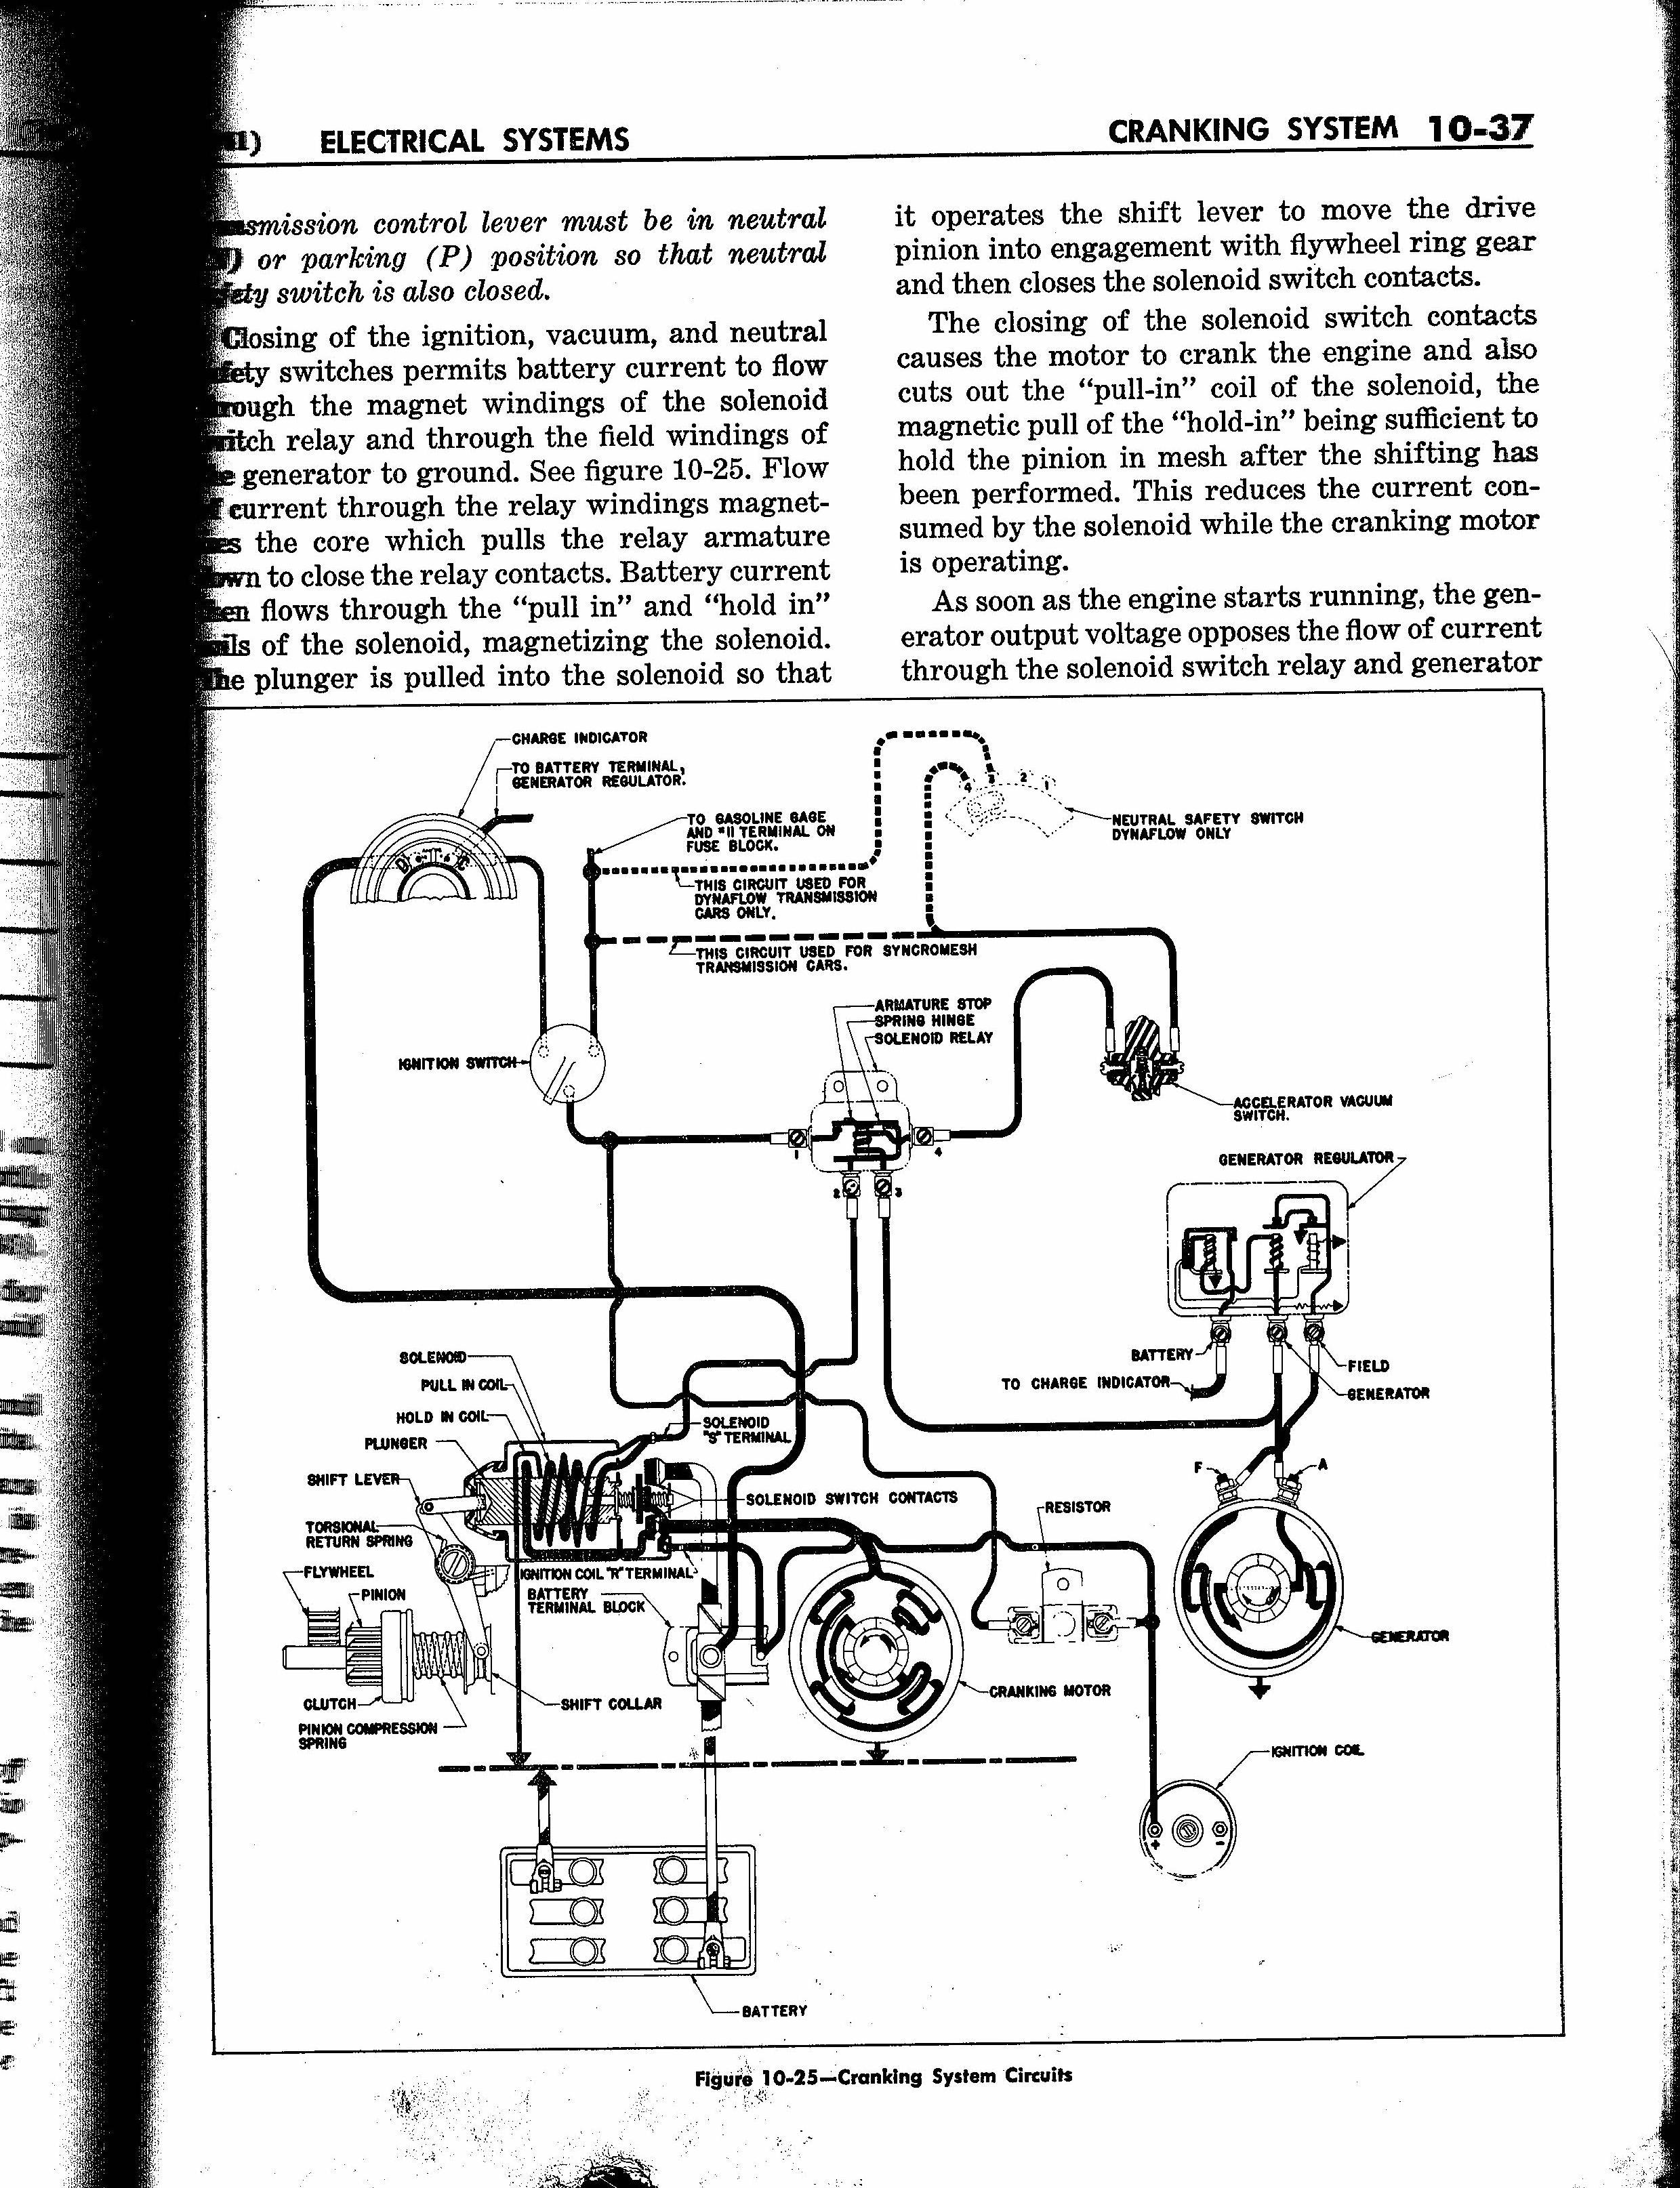 Return To Accelerator Start - Buick - Post War - Technical ... on